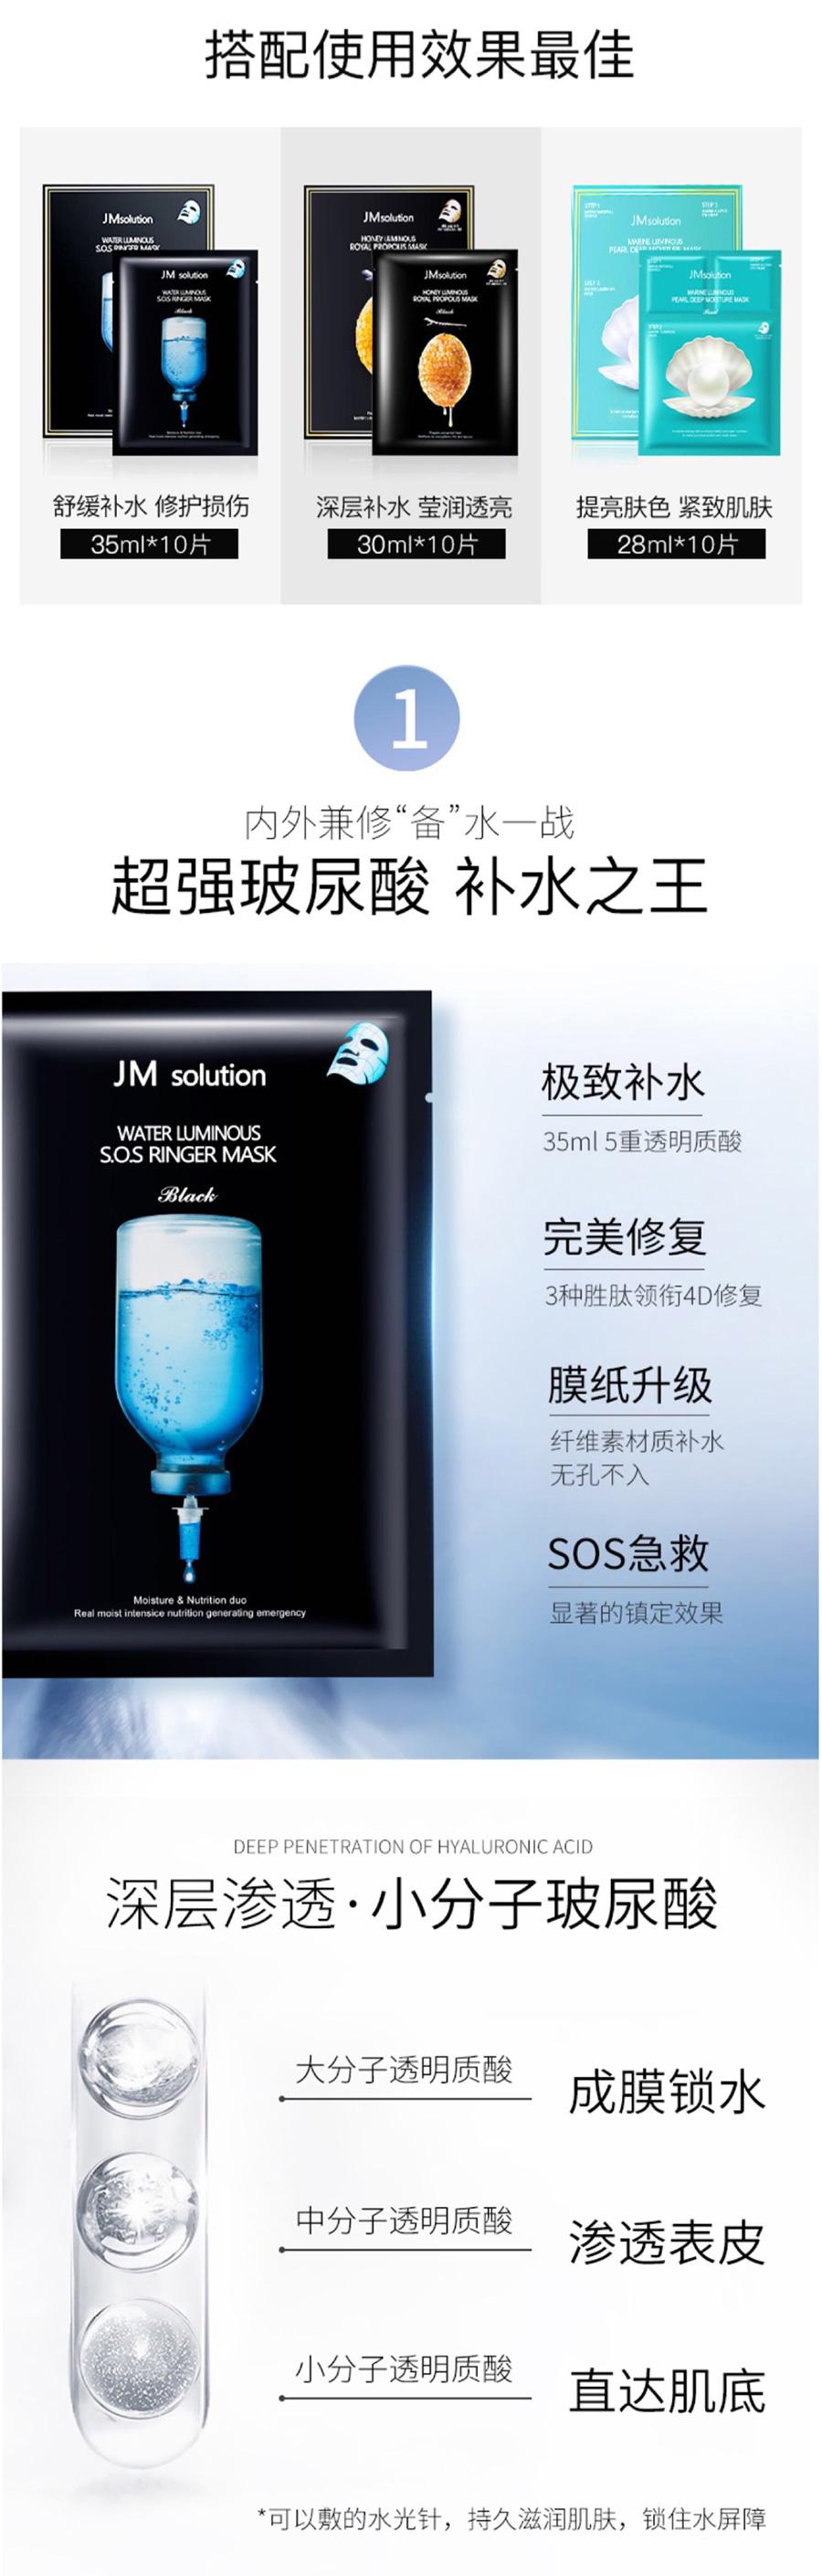 JMsolution面膜_02.jpg